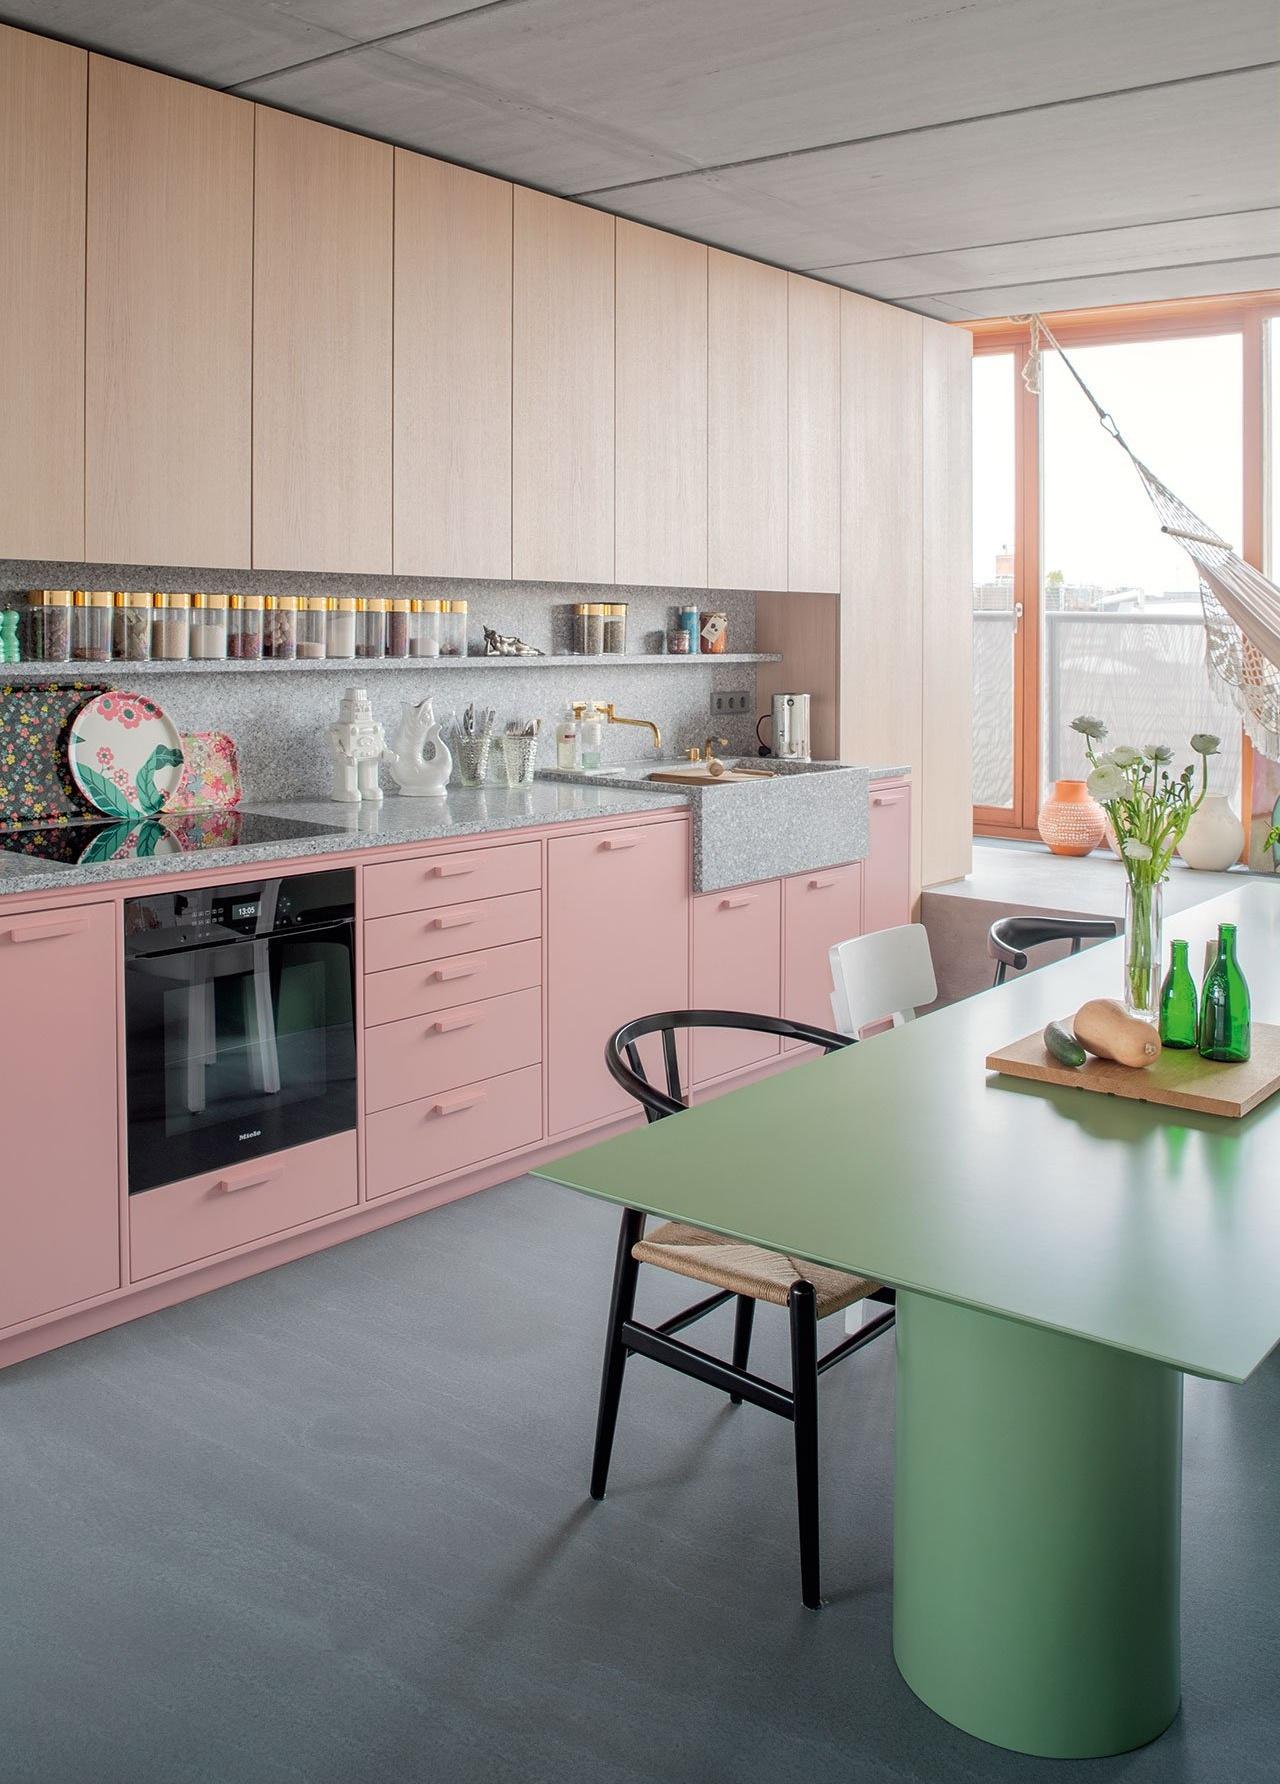 Яркая кухня с контрастными элементами